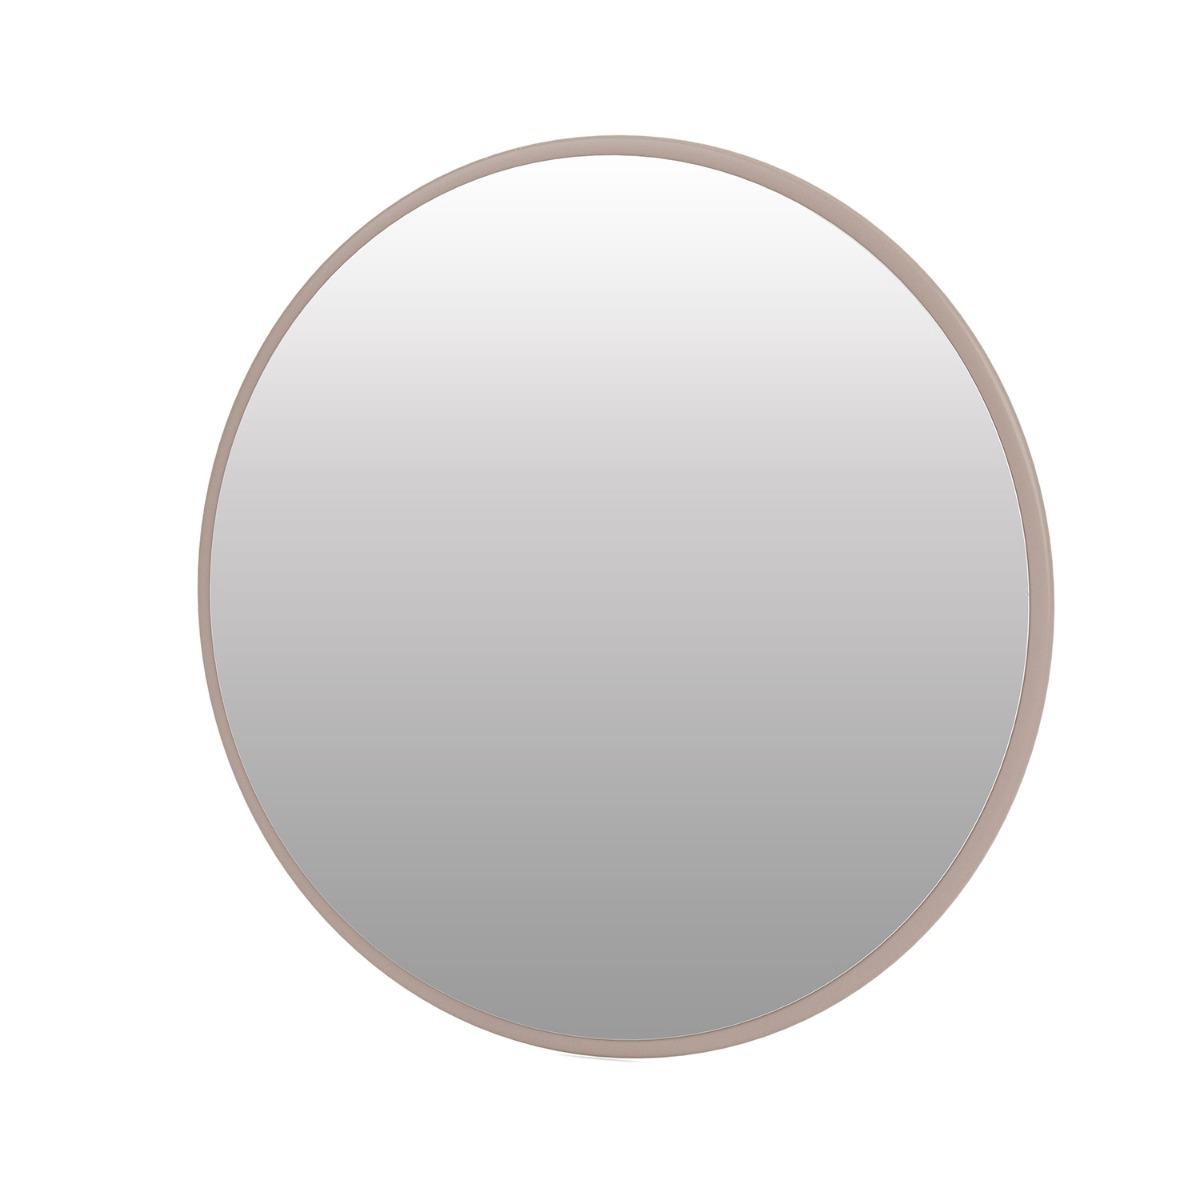 Montana Mini Spegel Rund 35 cm Mushroom